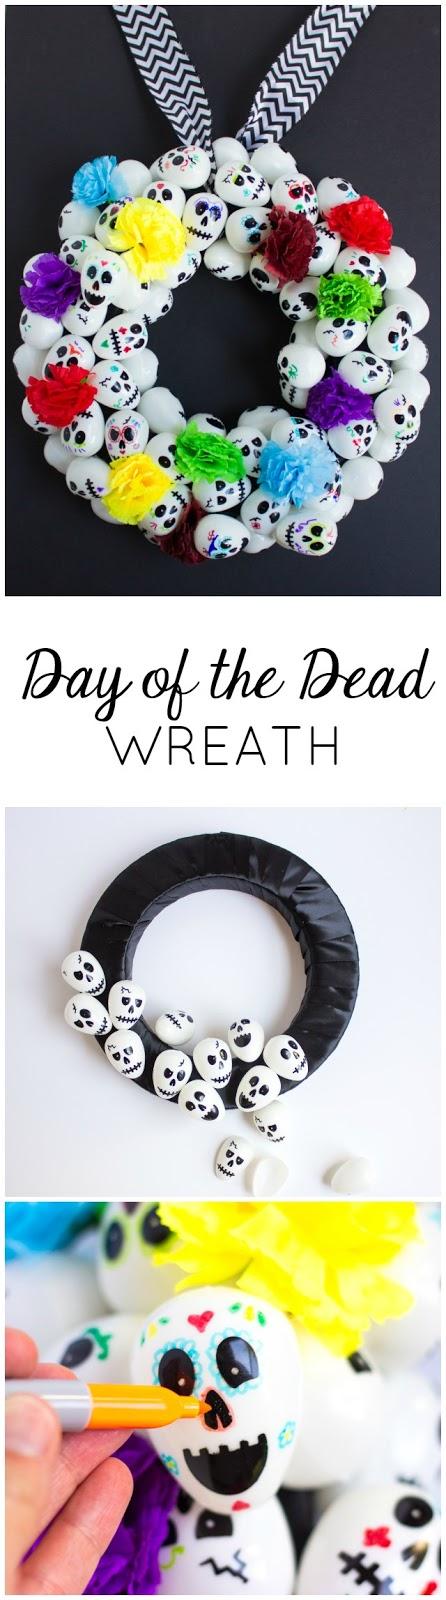 Make a Day of the Dead (Dia de los Muertos) wreath with plastic skull eggs!